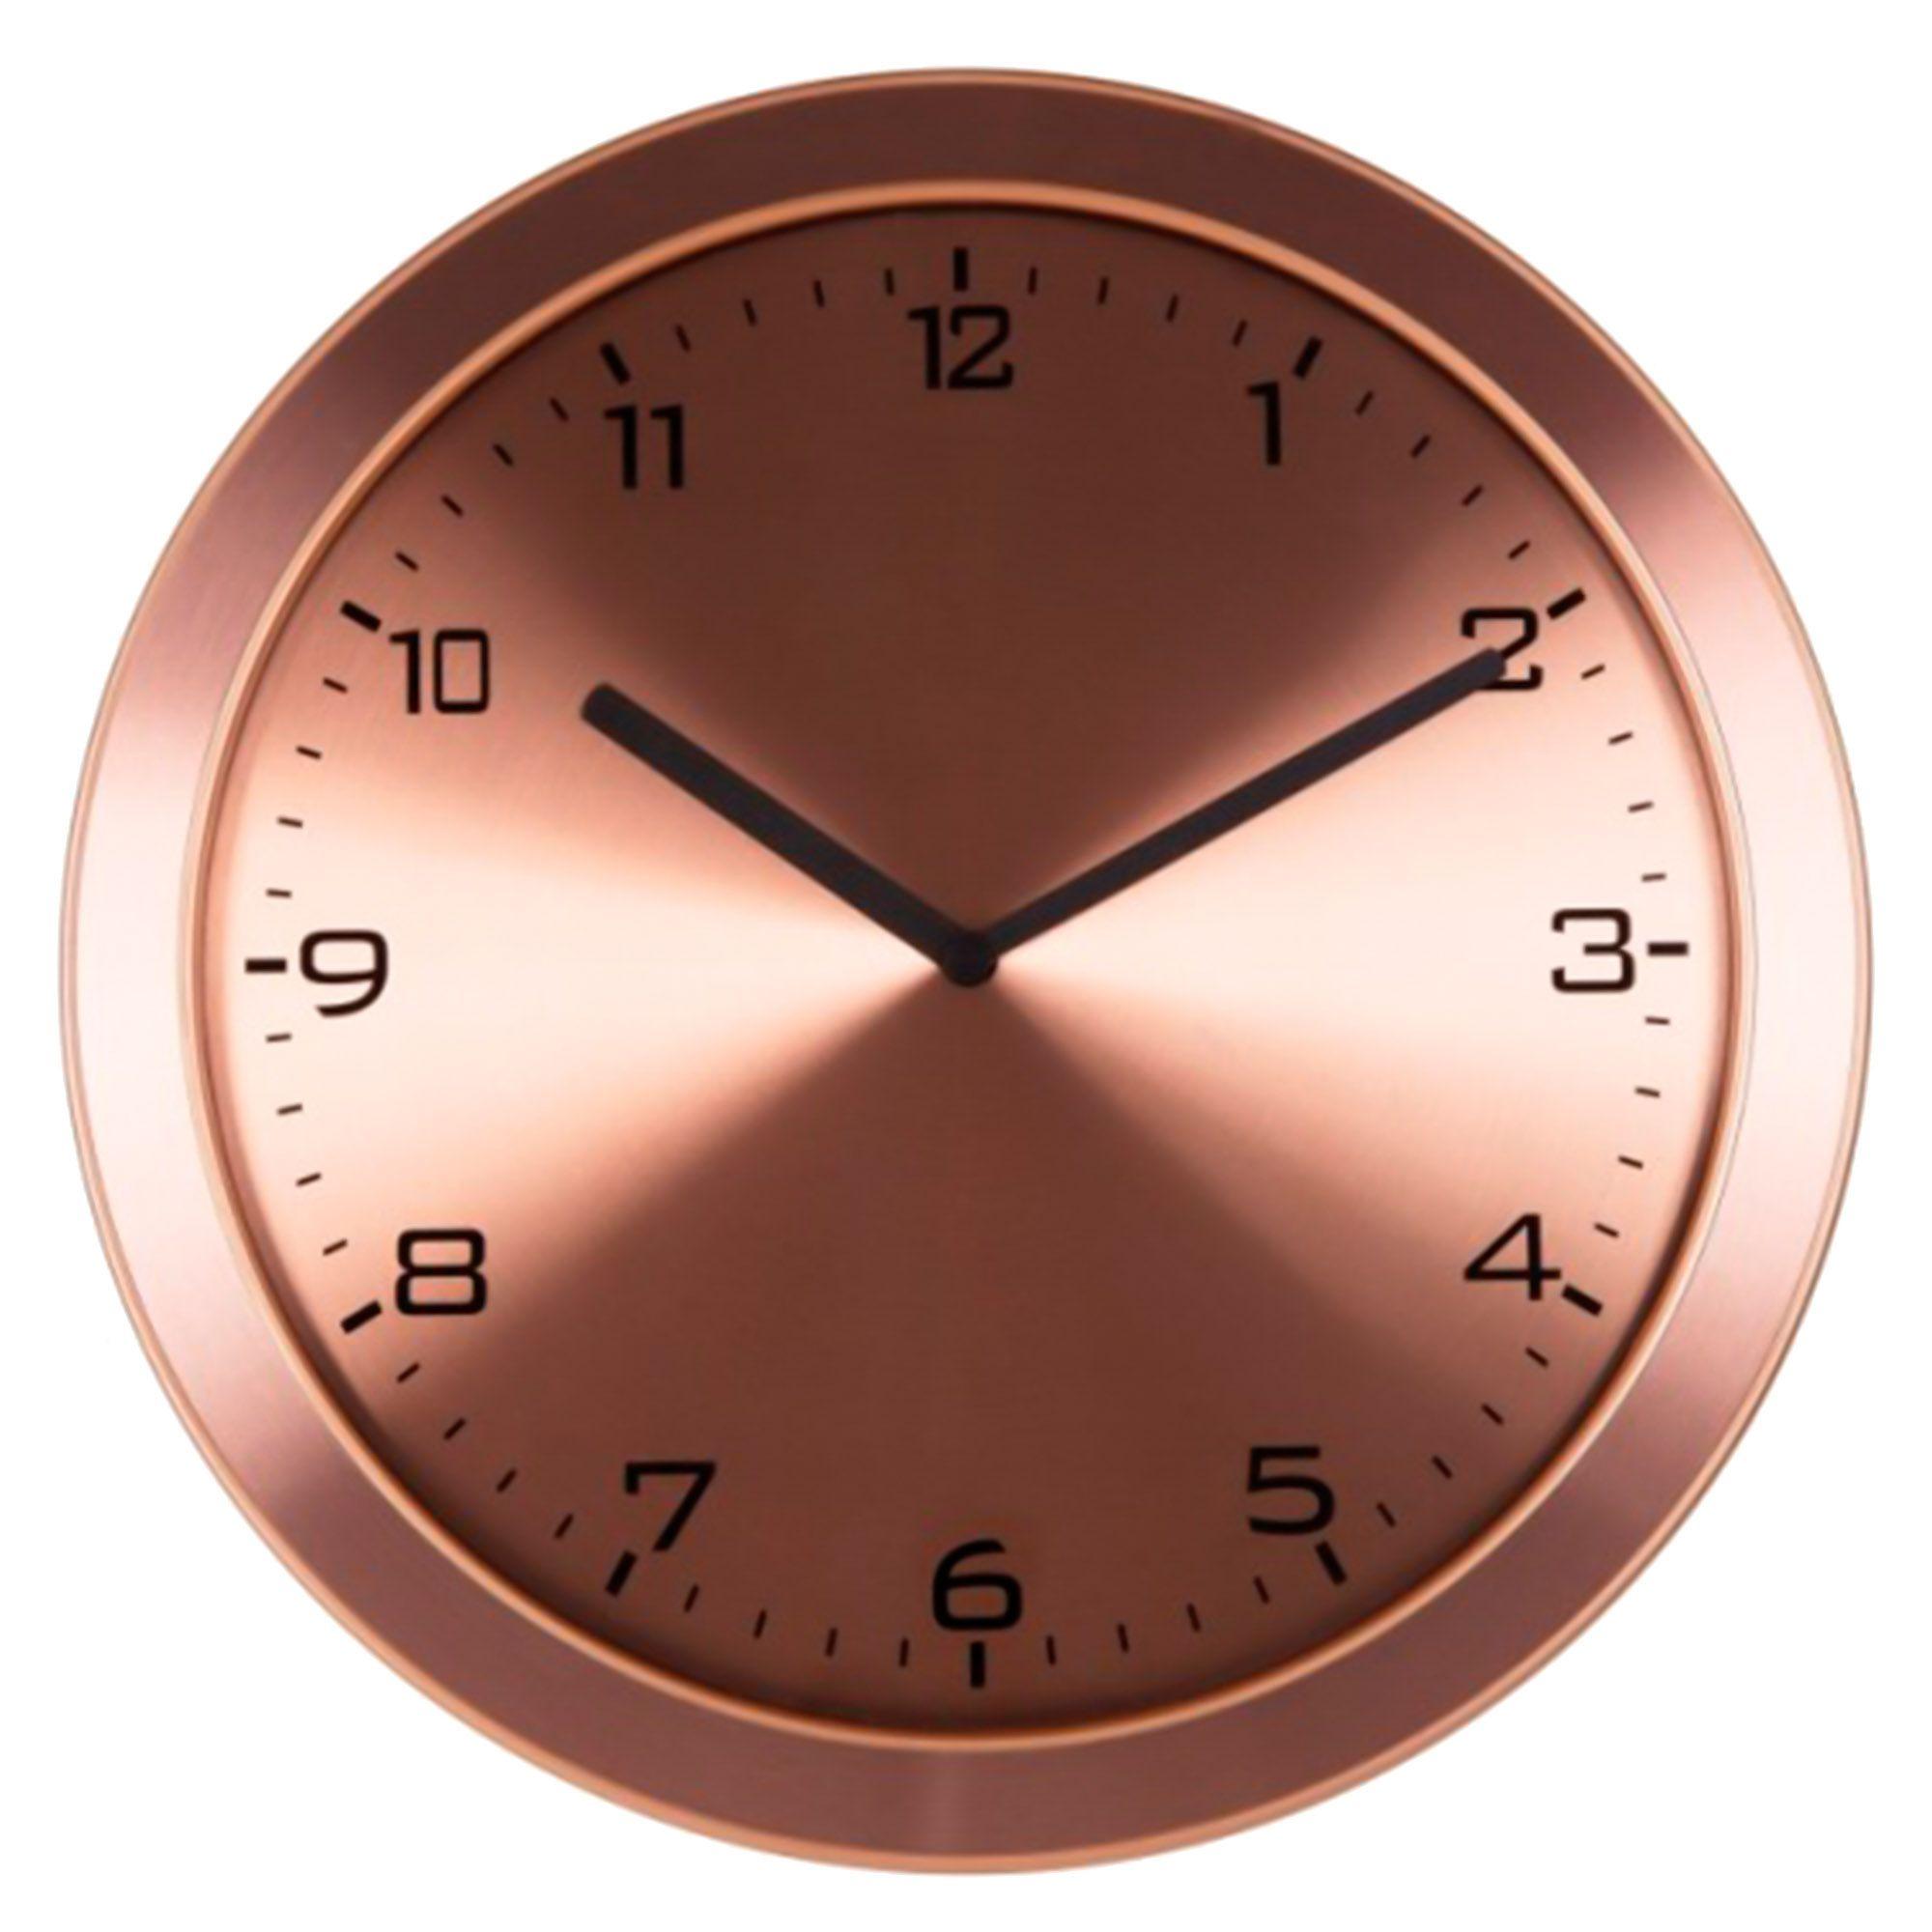 Relógio de Parede Analógico Herweg 6456 309 Rosê